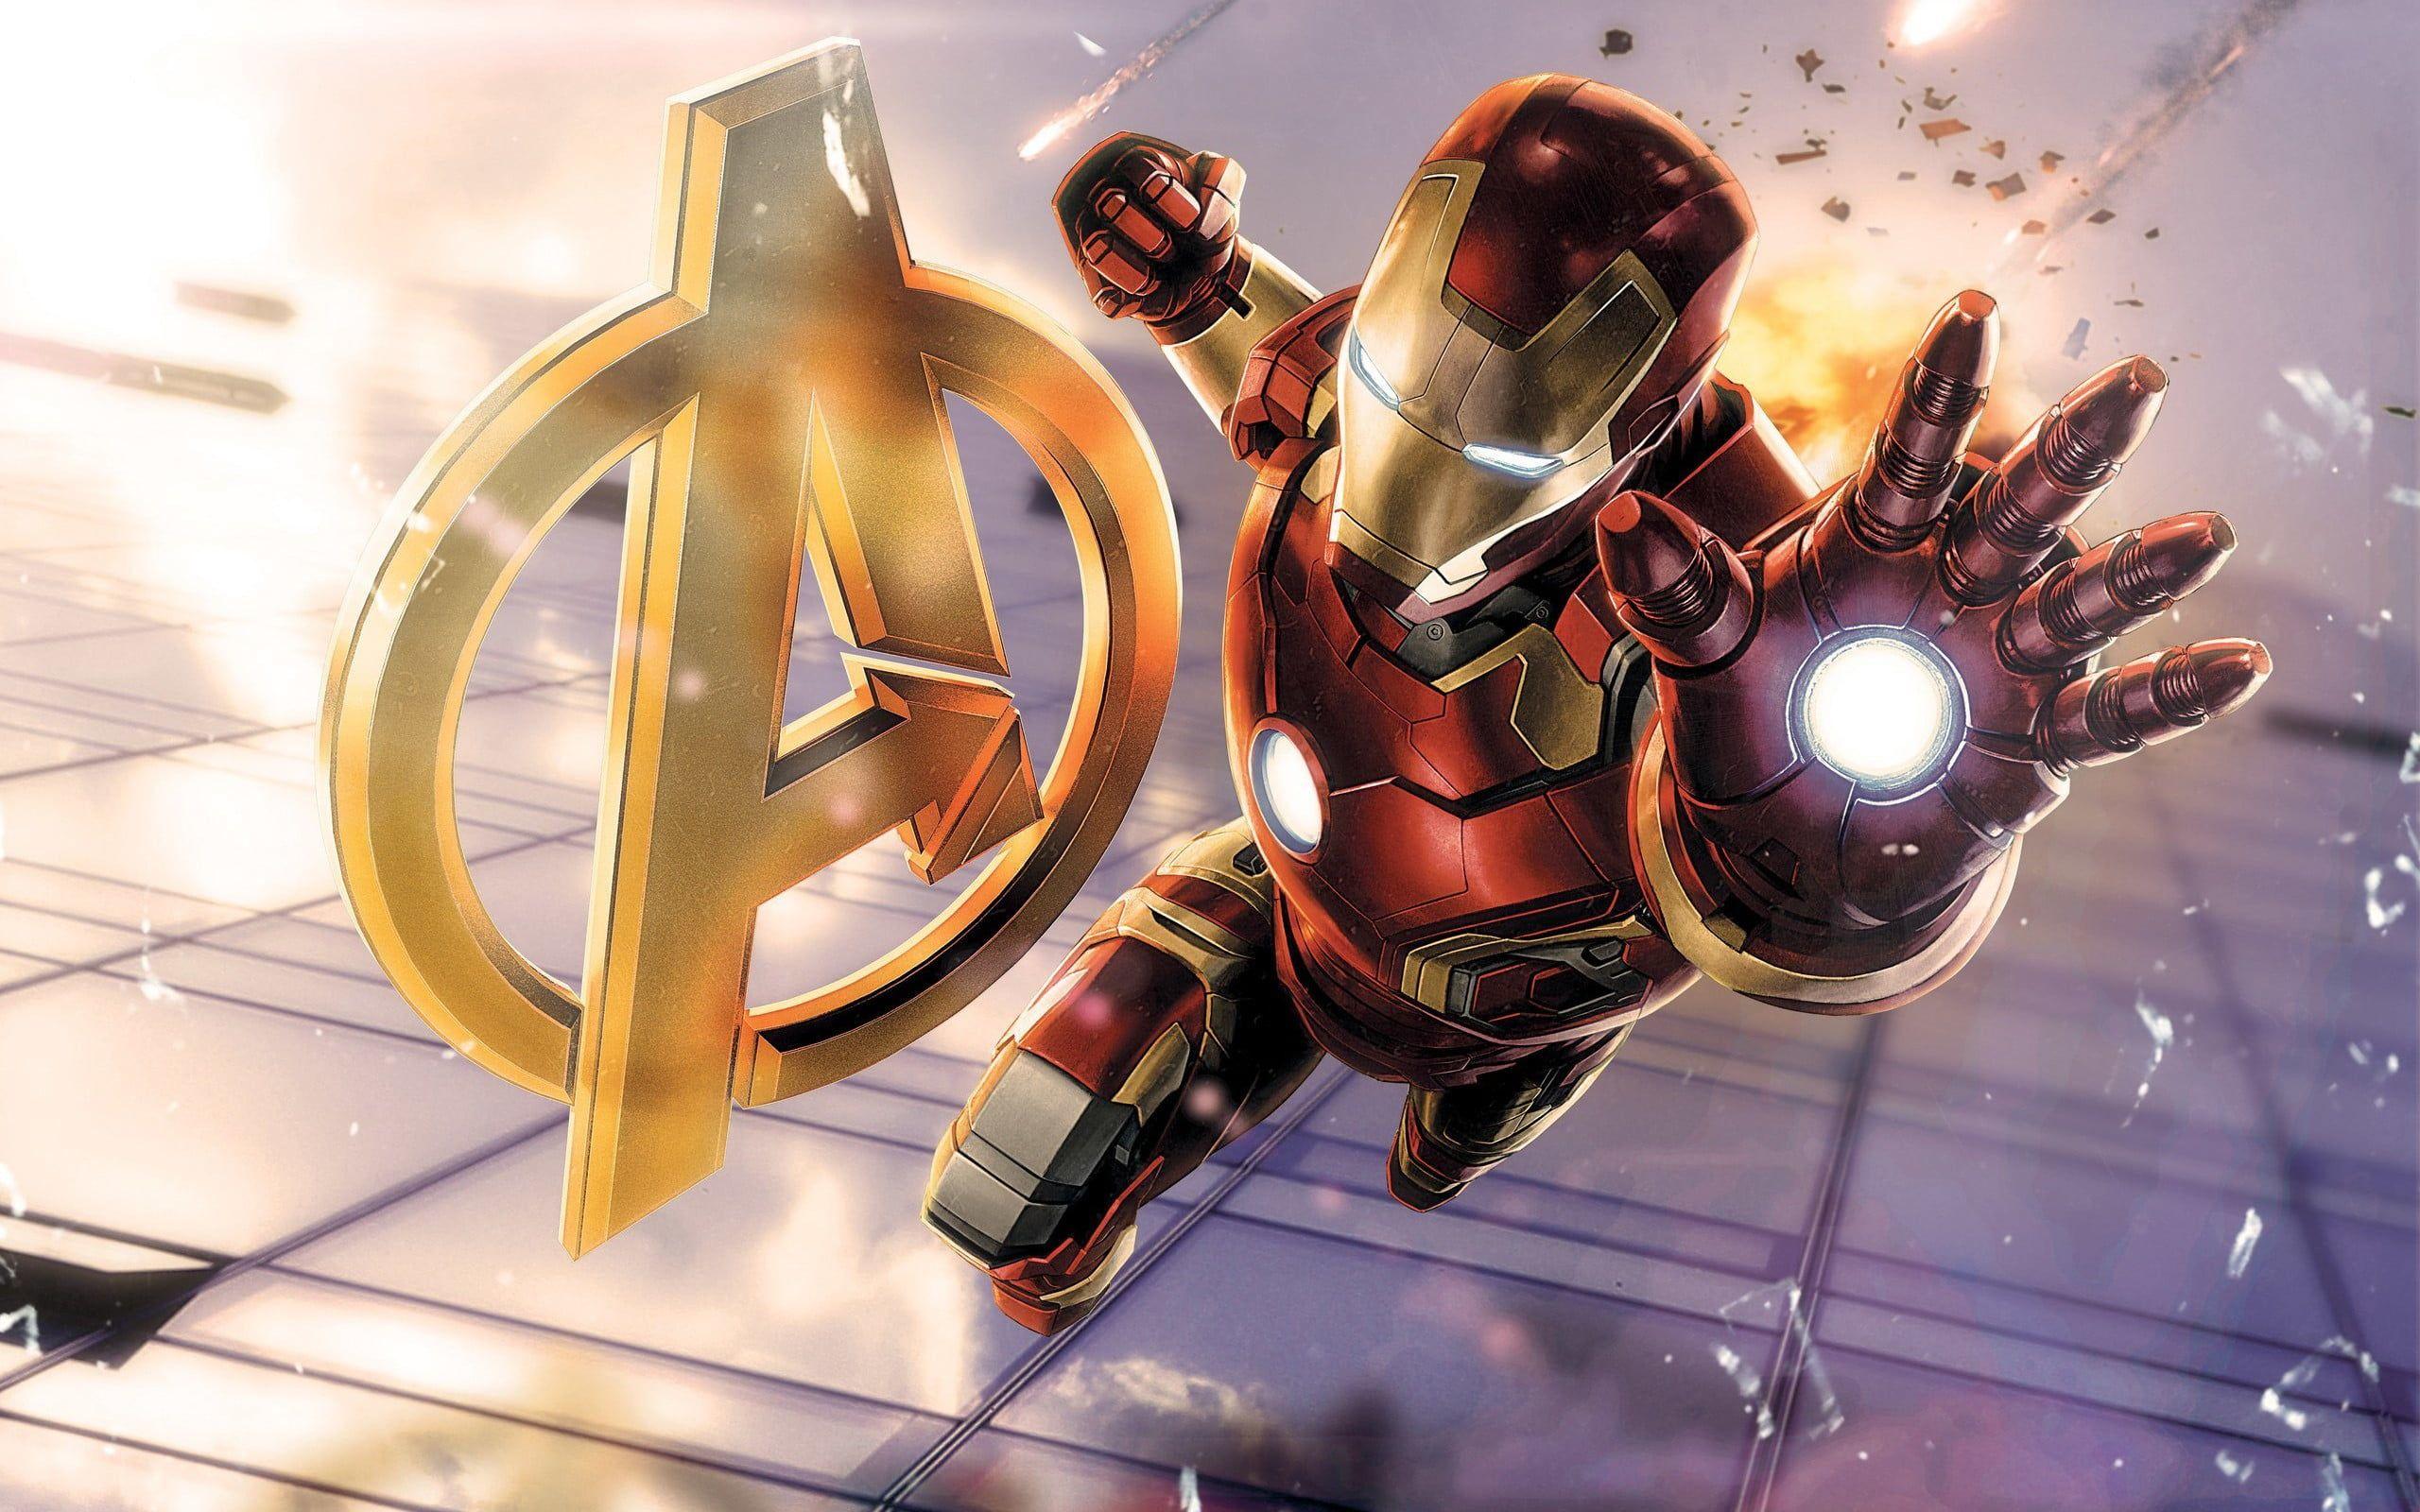 Marvel Avengers Iron Man Digital Wallpaper Iron Man Broken Glass Superhero Avengers Age Of Ultron Marvel Iron Man Avengers Iron Man Flying Iron Man Wallpaper